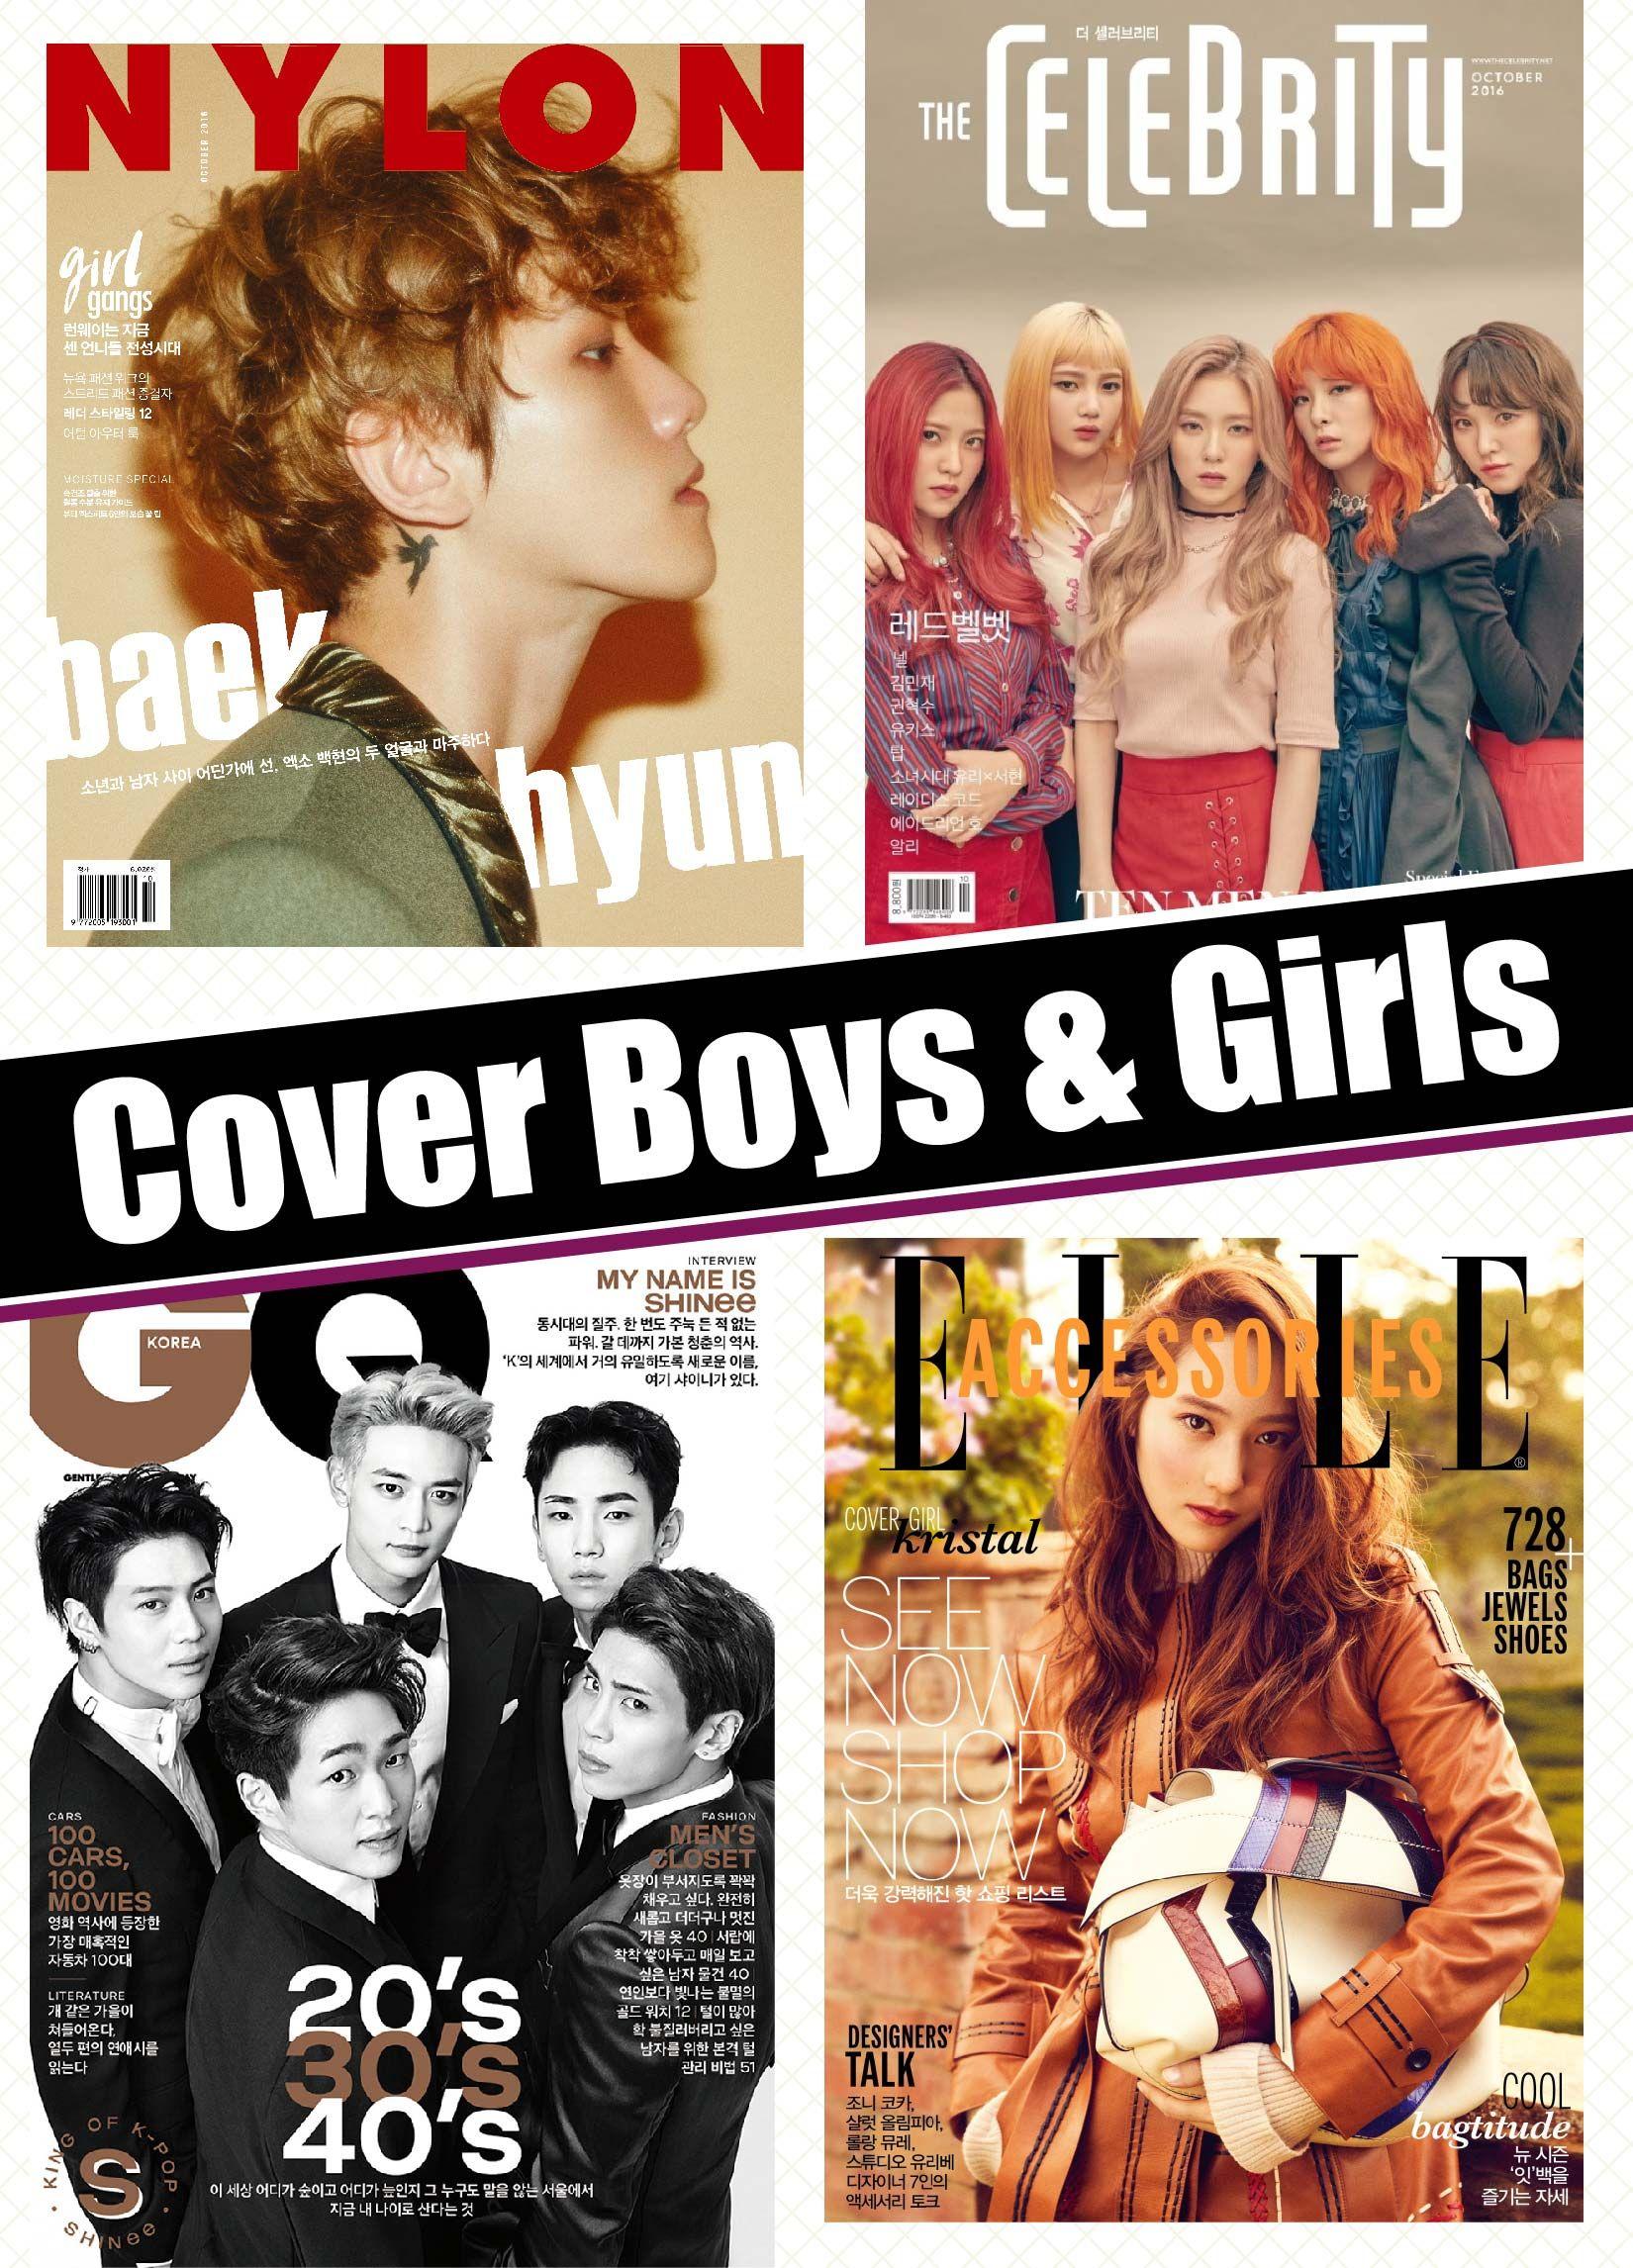 [Vyrl] Diary :  #SHINee #fx #EXO #RedVelvet #VyStyle 바이럴리안 여러분, 서점 잡지코너 가보셨나요?  #EXO